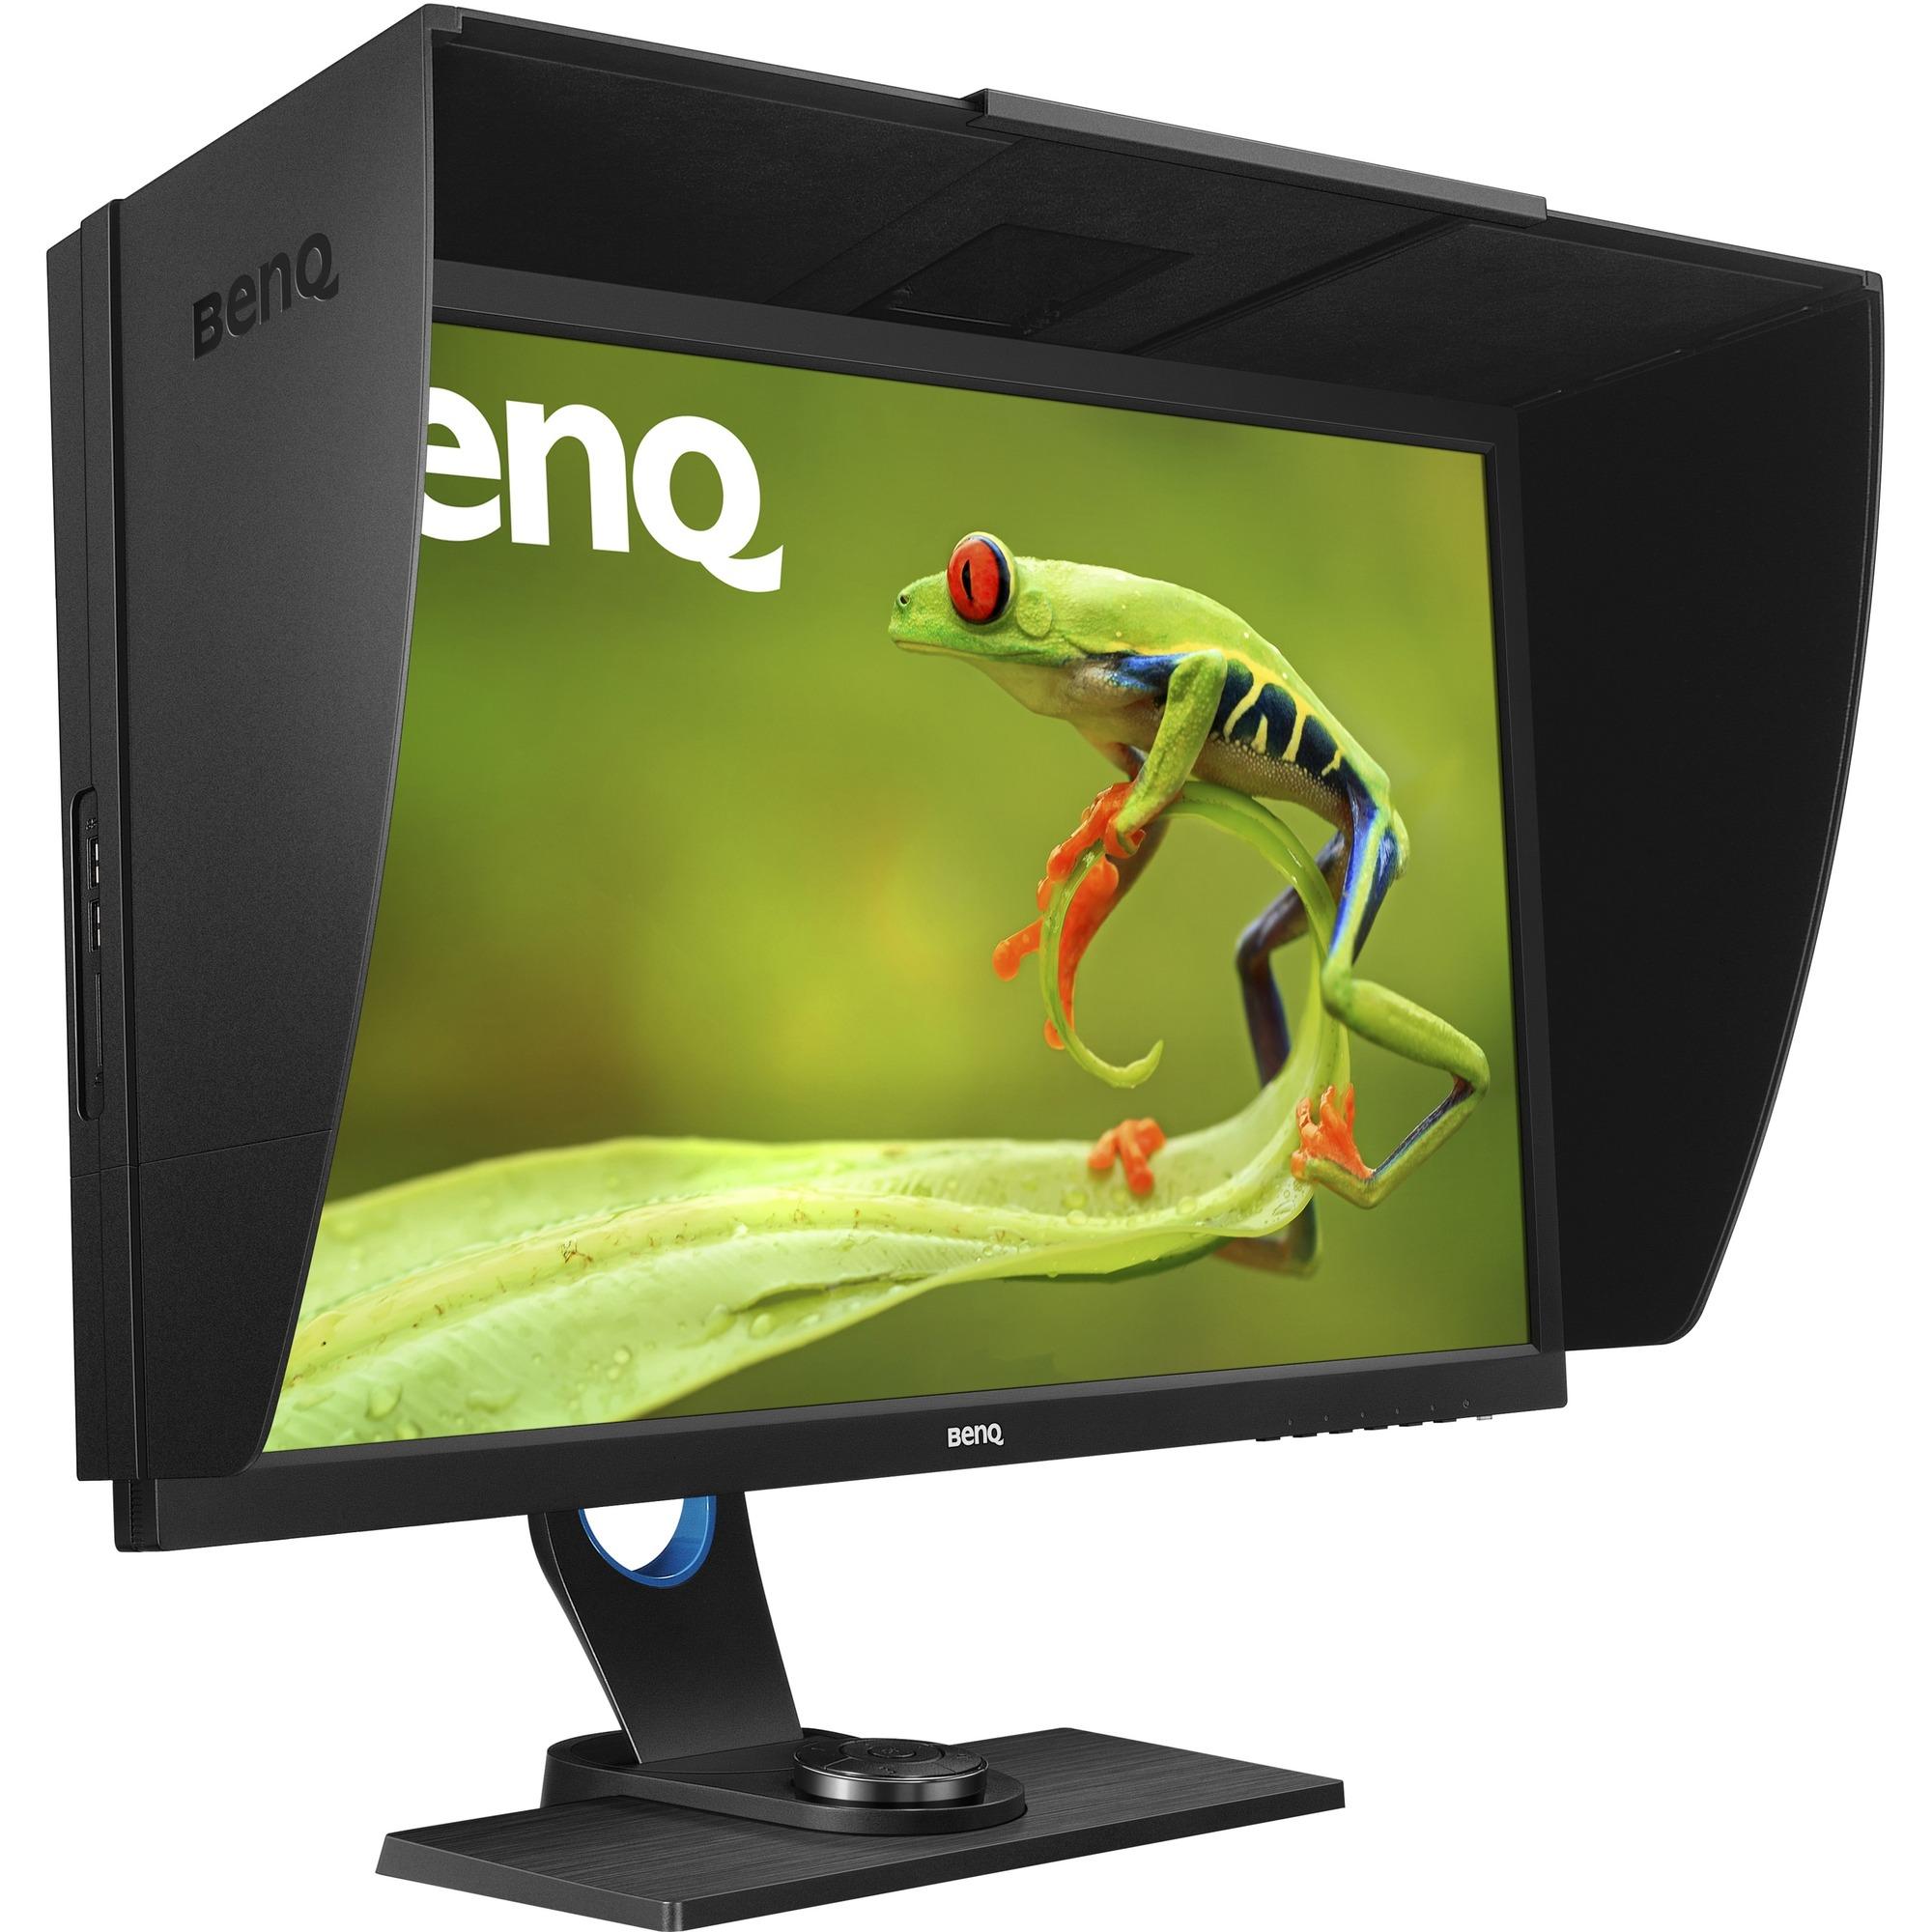 BenQ SW2700PT  27inch LED Monitor - 16:9 - 5 ms